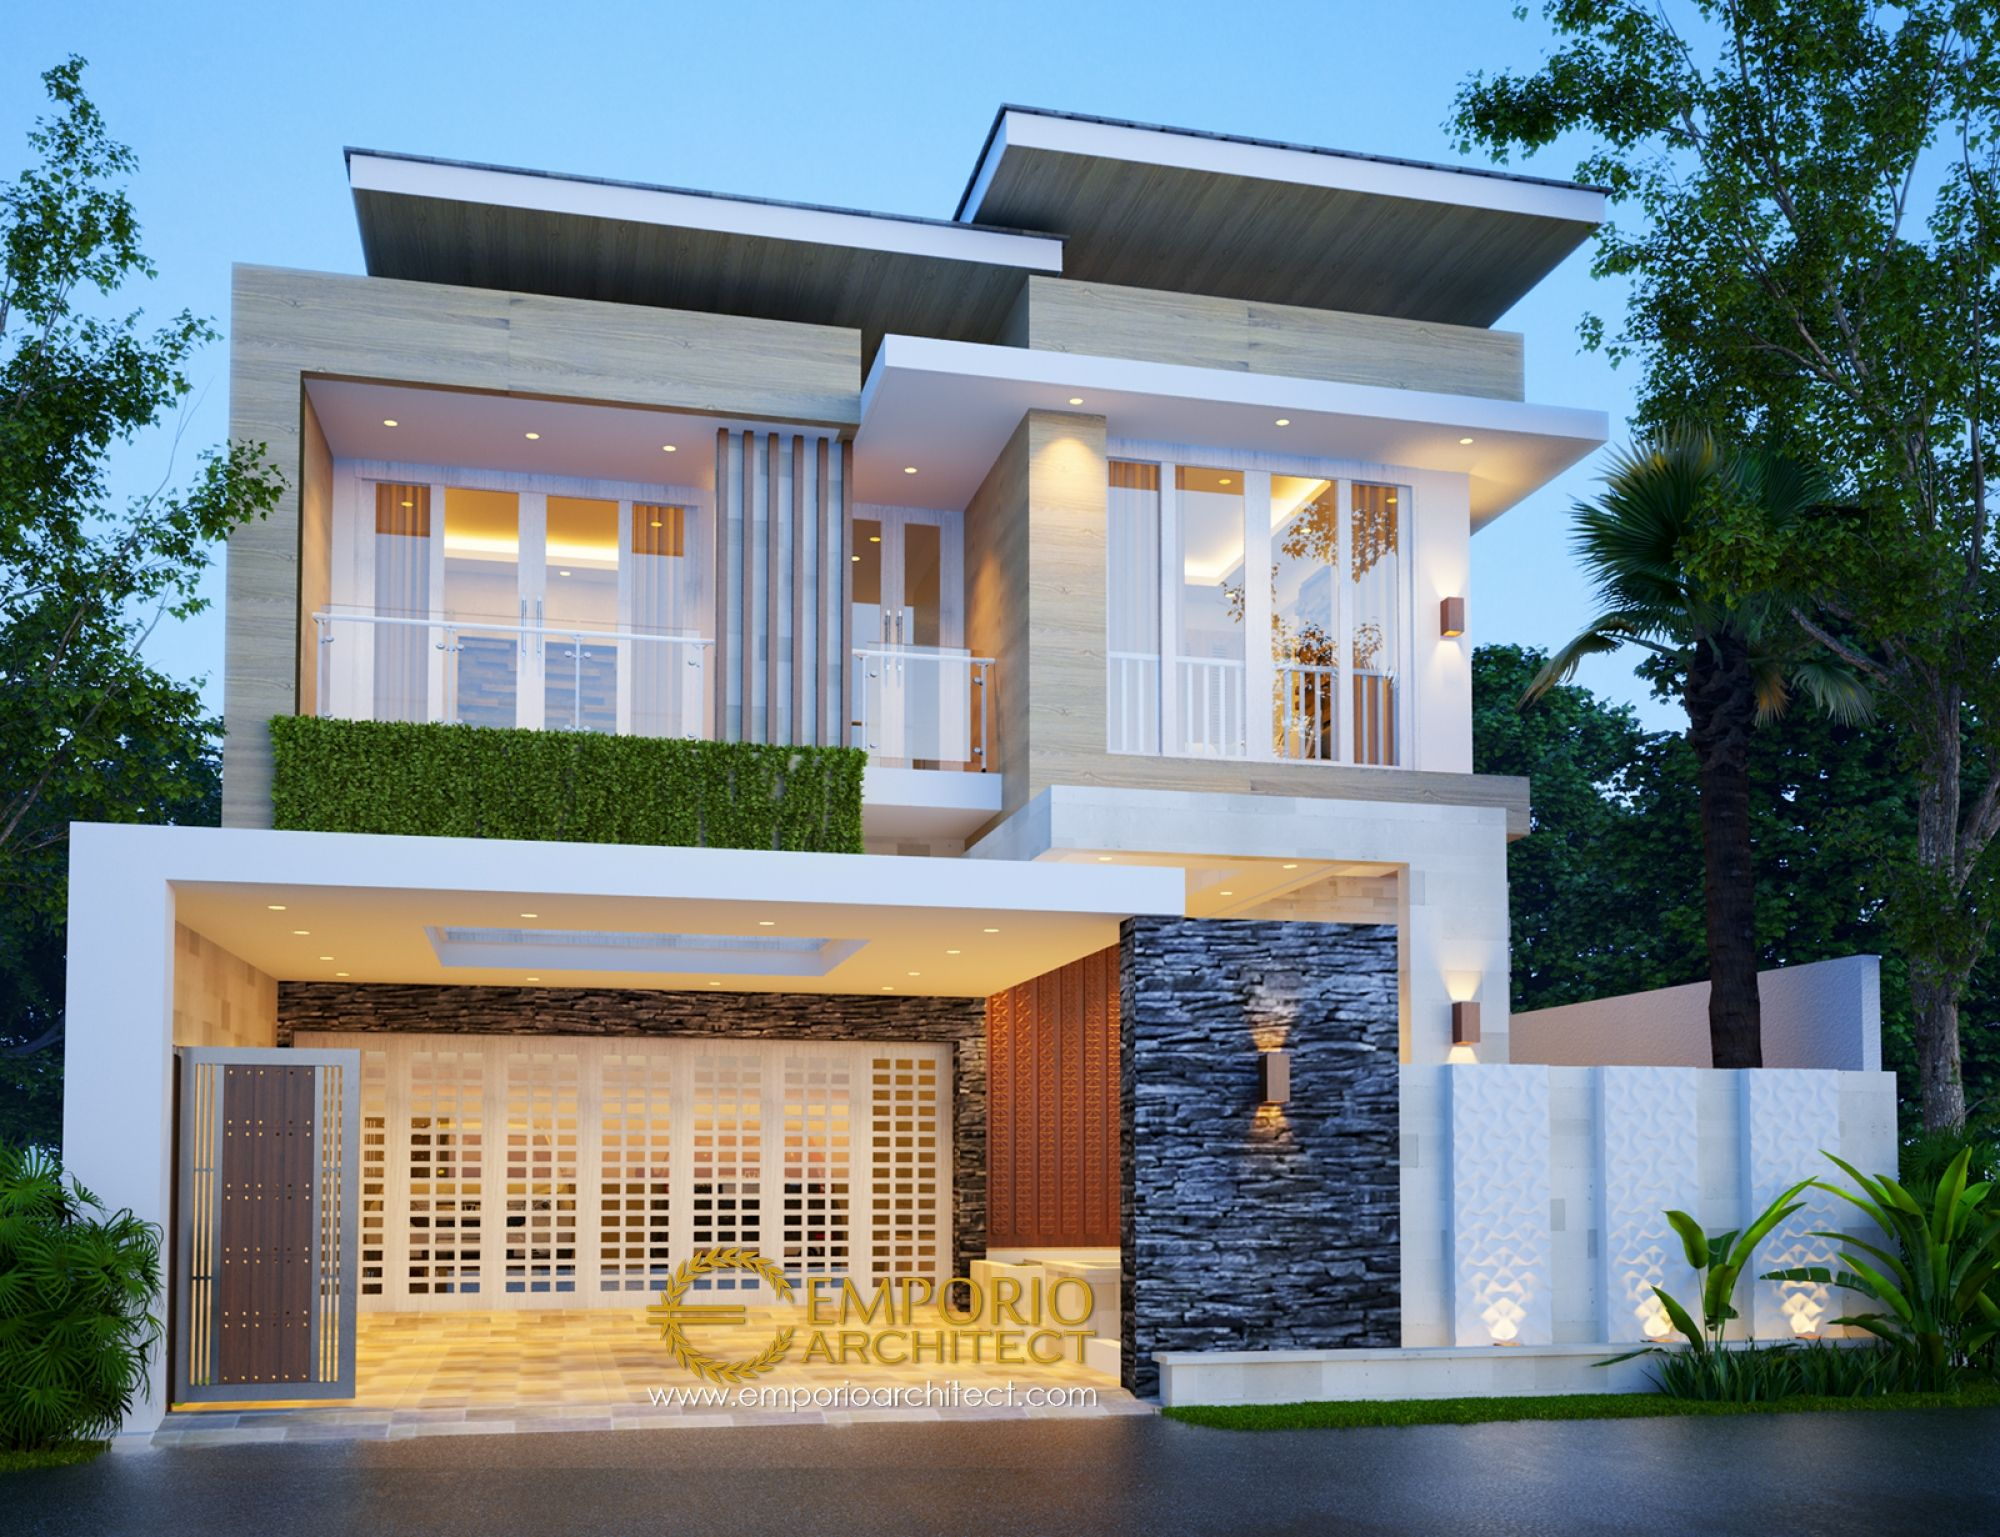 Jasa Arsitek Cirebon Jawa Barat Desain Rumah Bapak Dwi